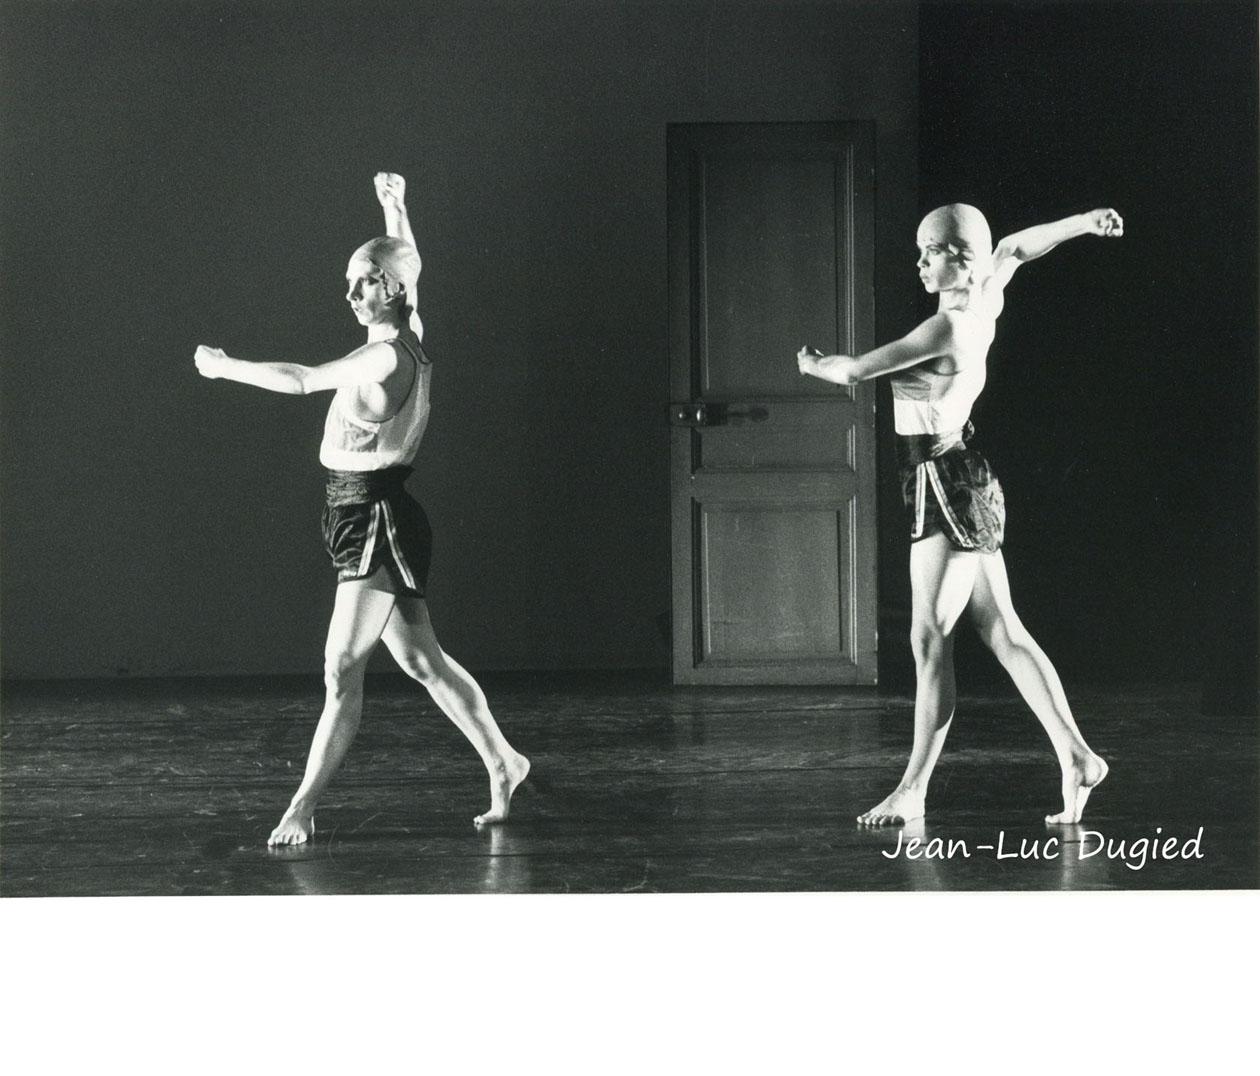 12 Martinez Graziella - à la folie - Christiane Grun et Véronique Legoaziou - 1985